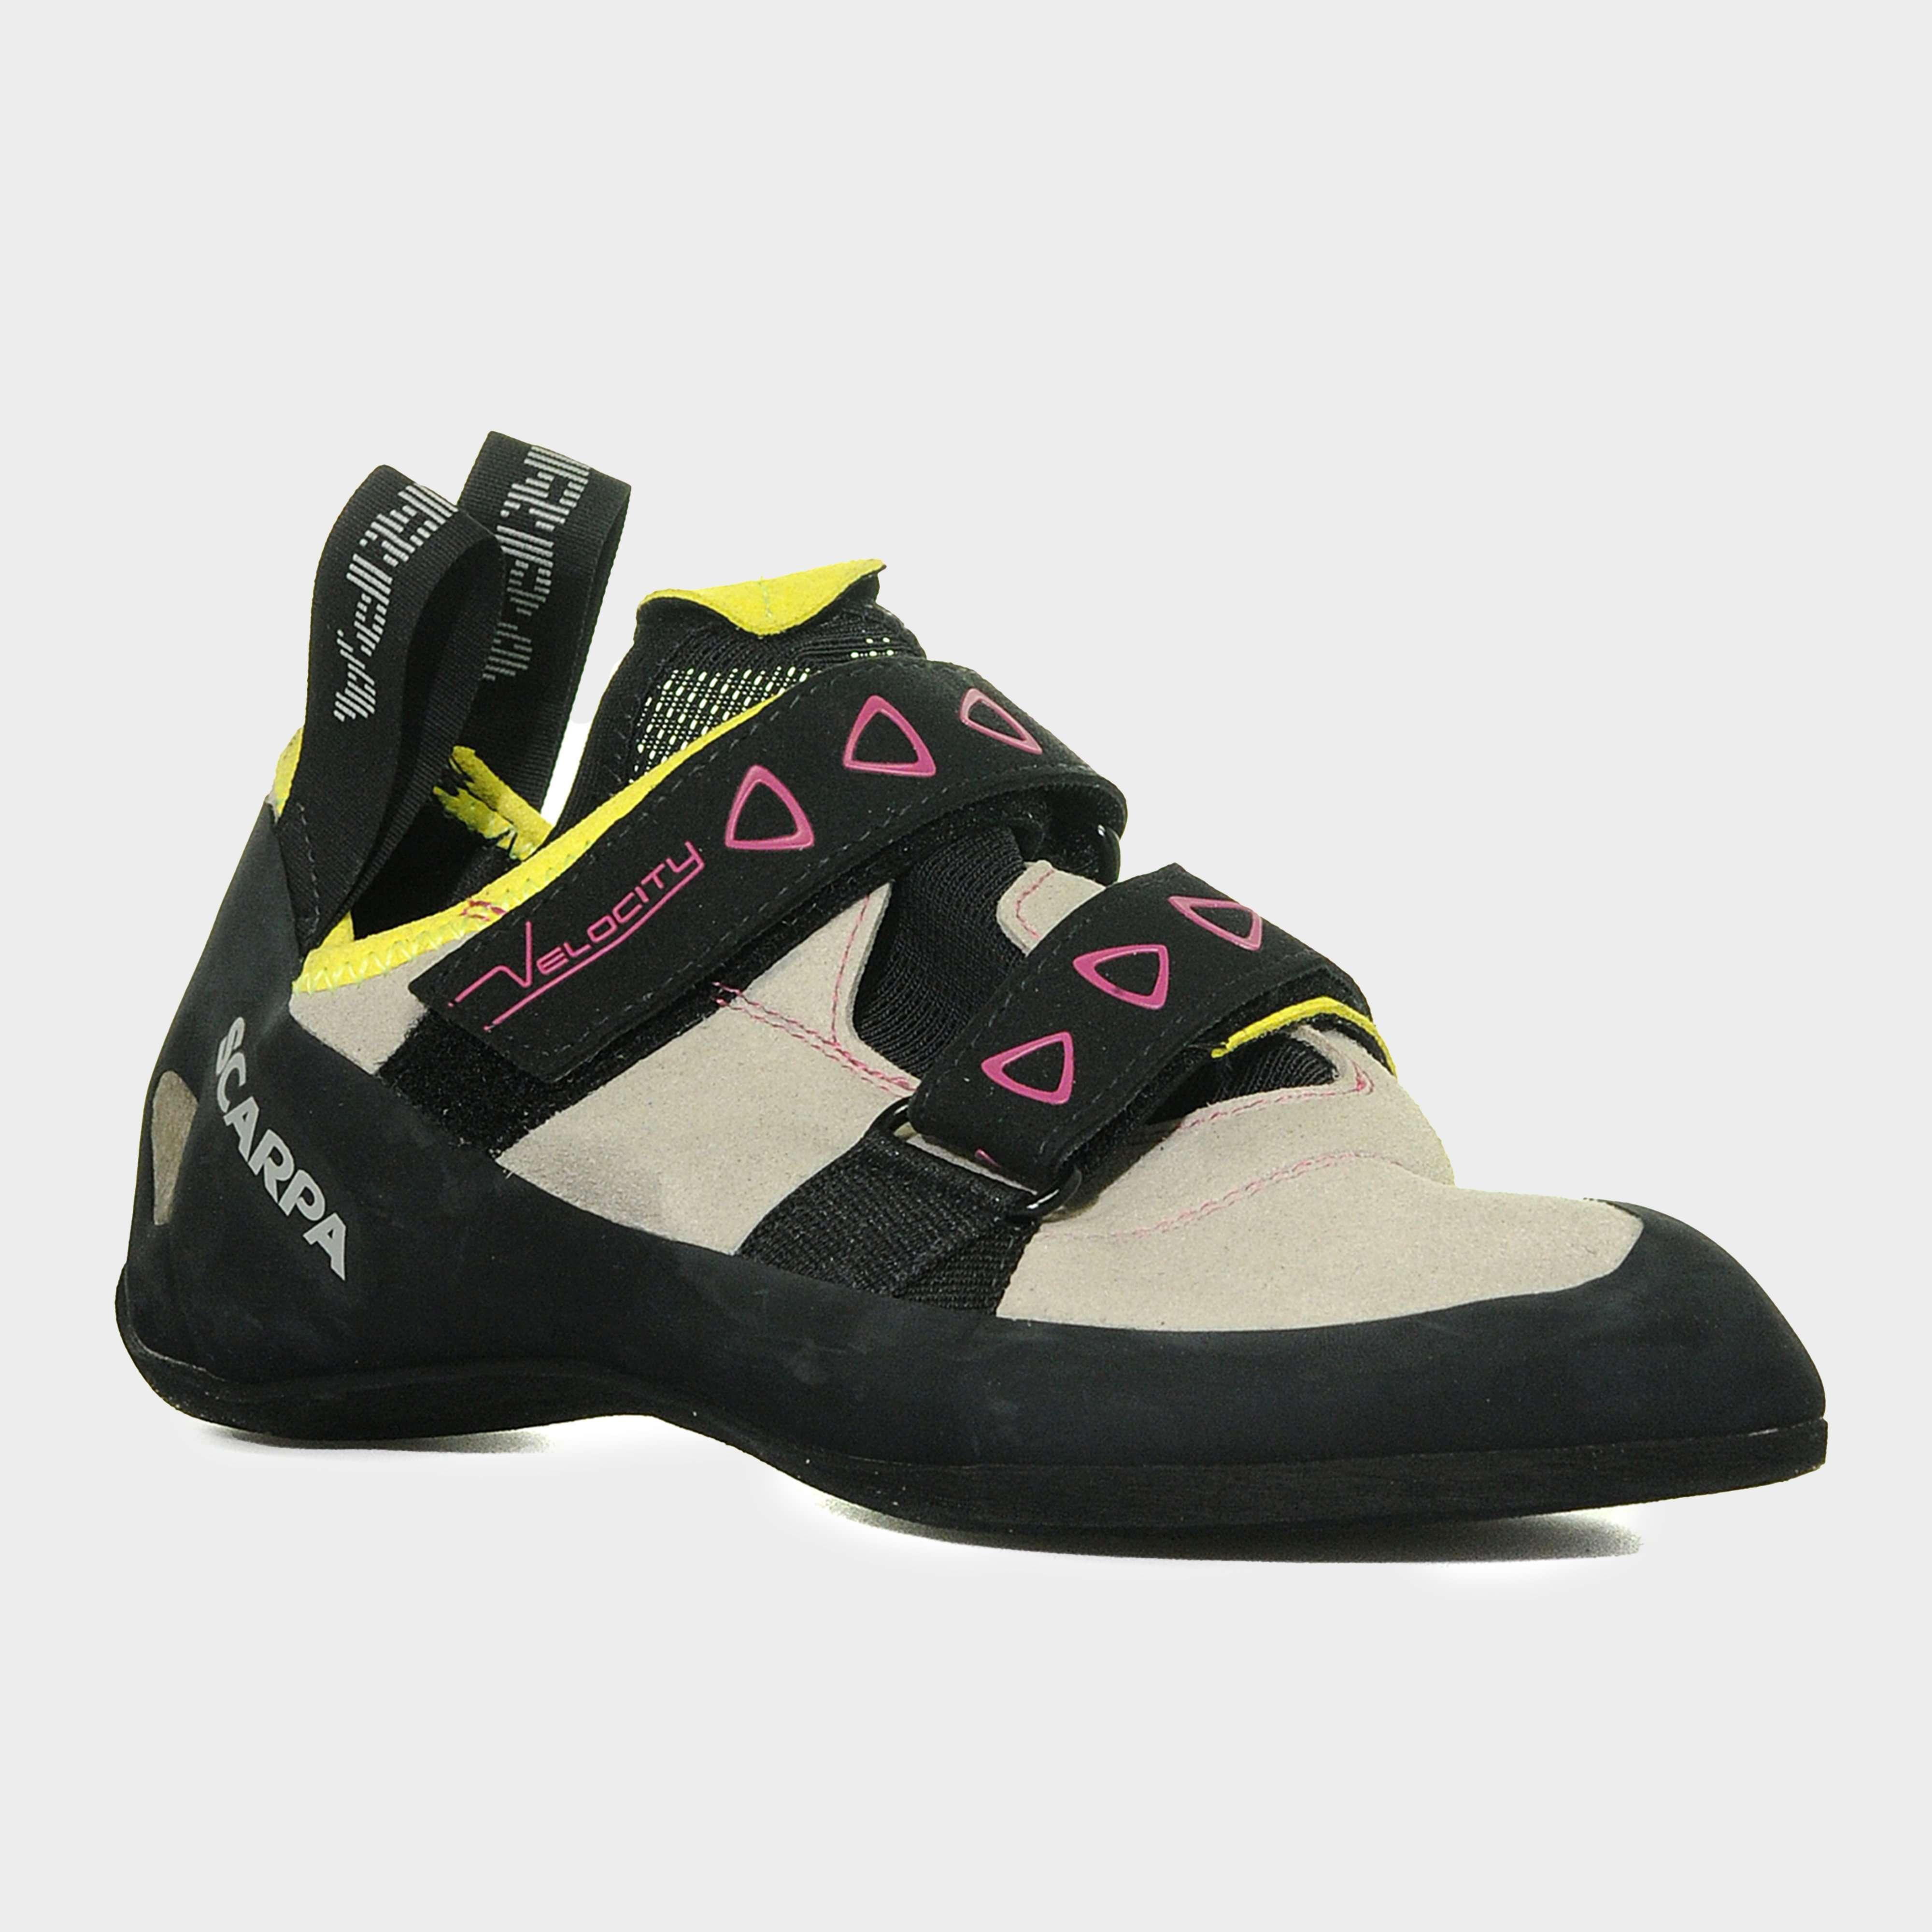 SCARPA Women's Velocity V Climbing Shoe Grey